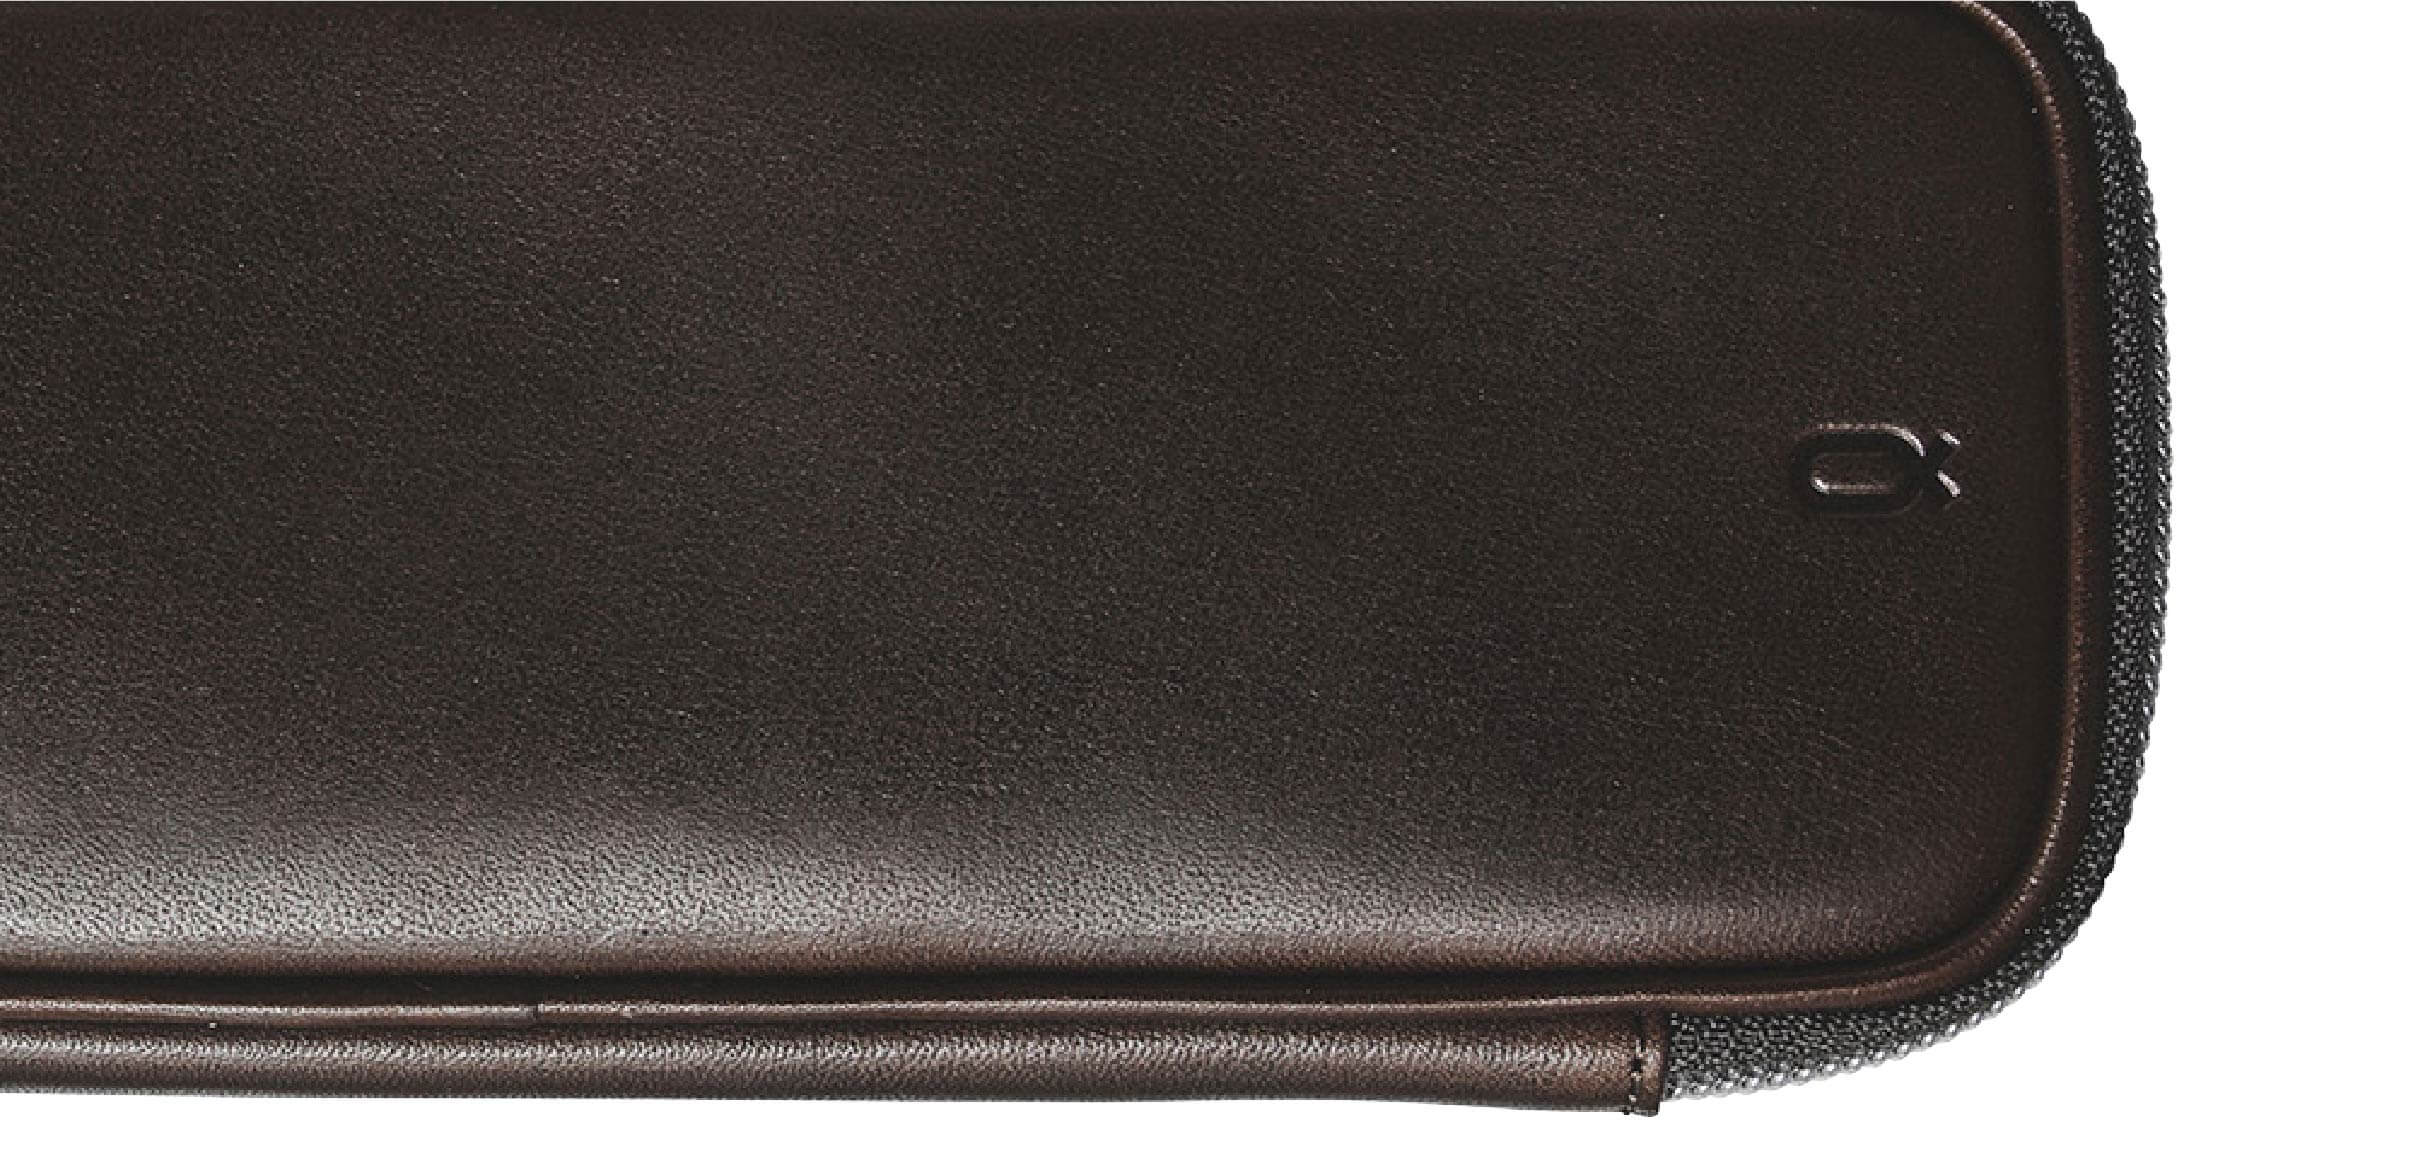 Tochigi leather portable watch case